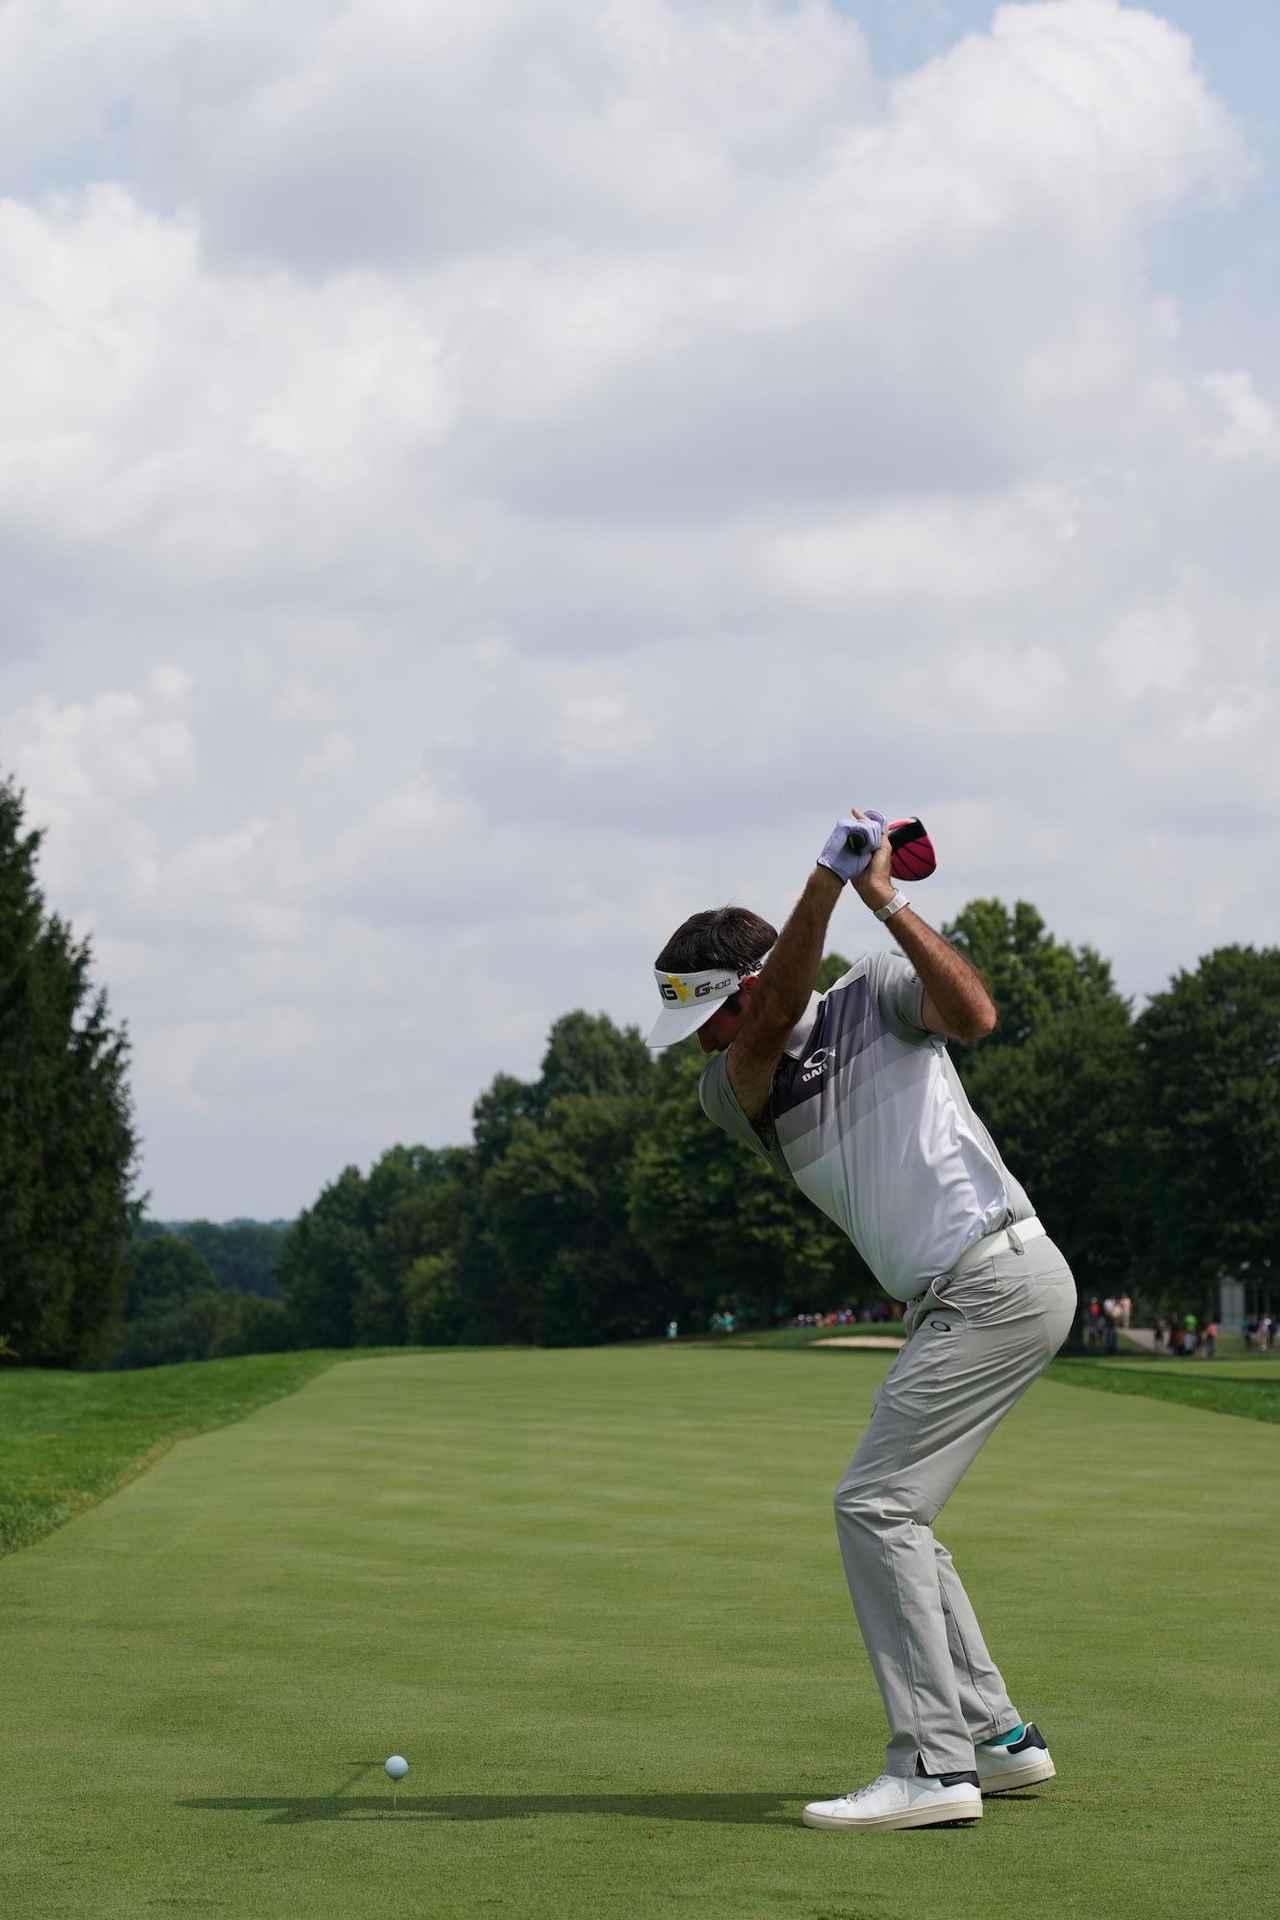 Images : 13番目の画像 - 強烈! バッバ・ワトソンのドライバーショット - みんなのゴルフダイジェスト